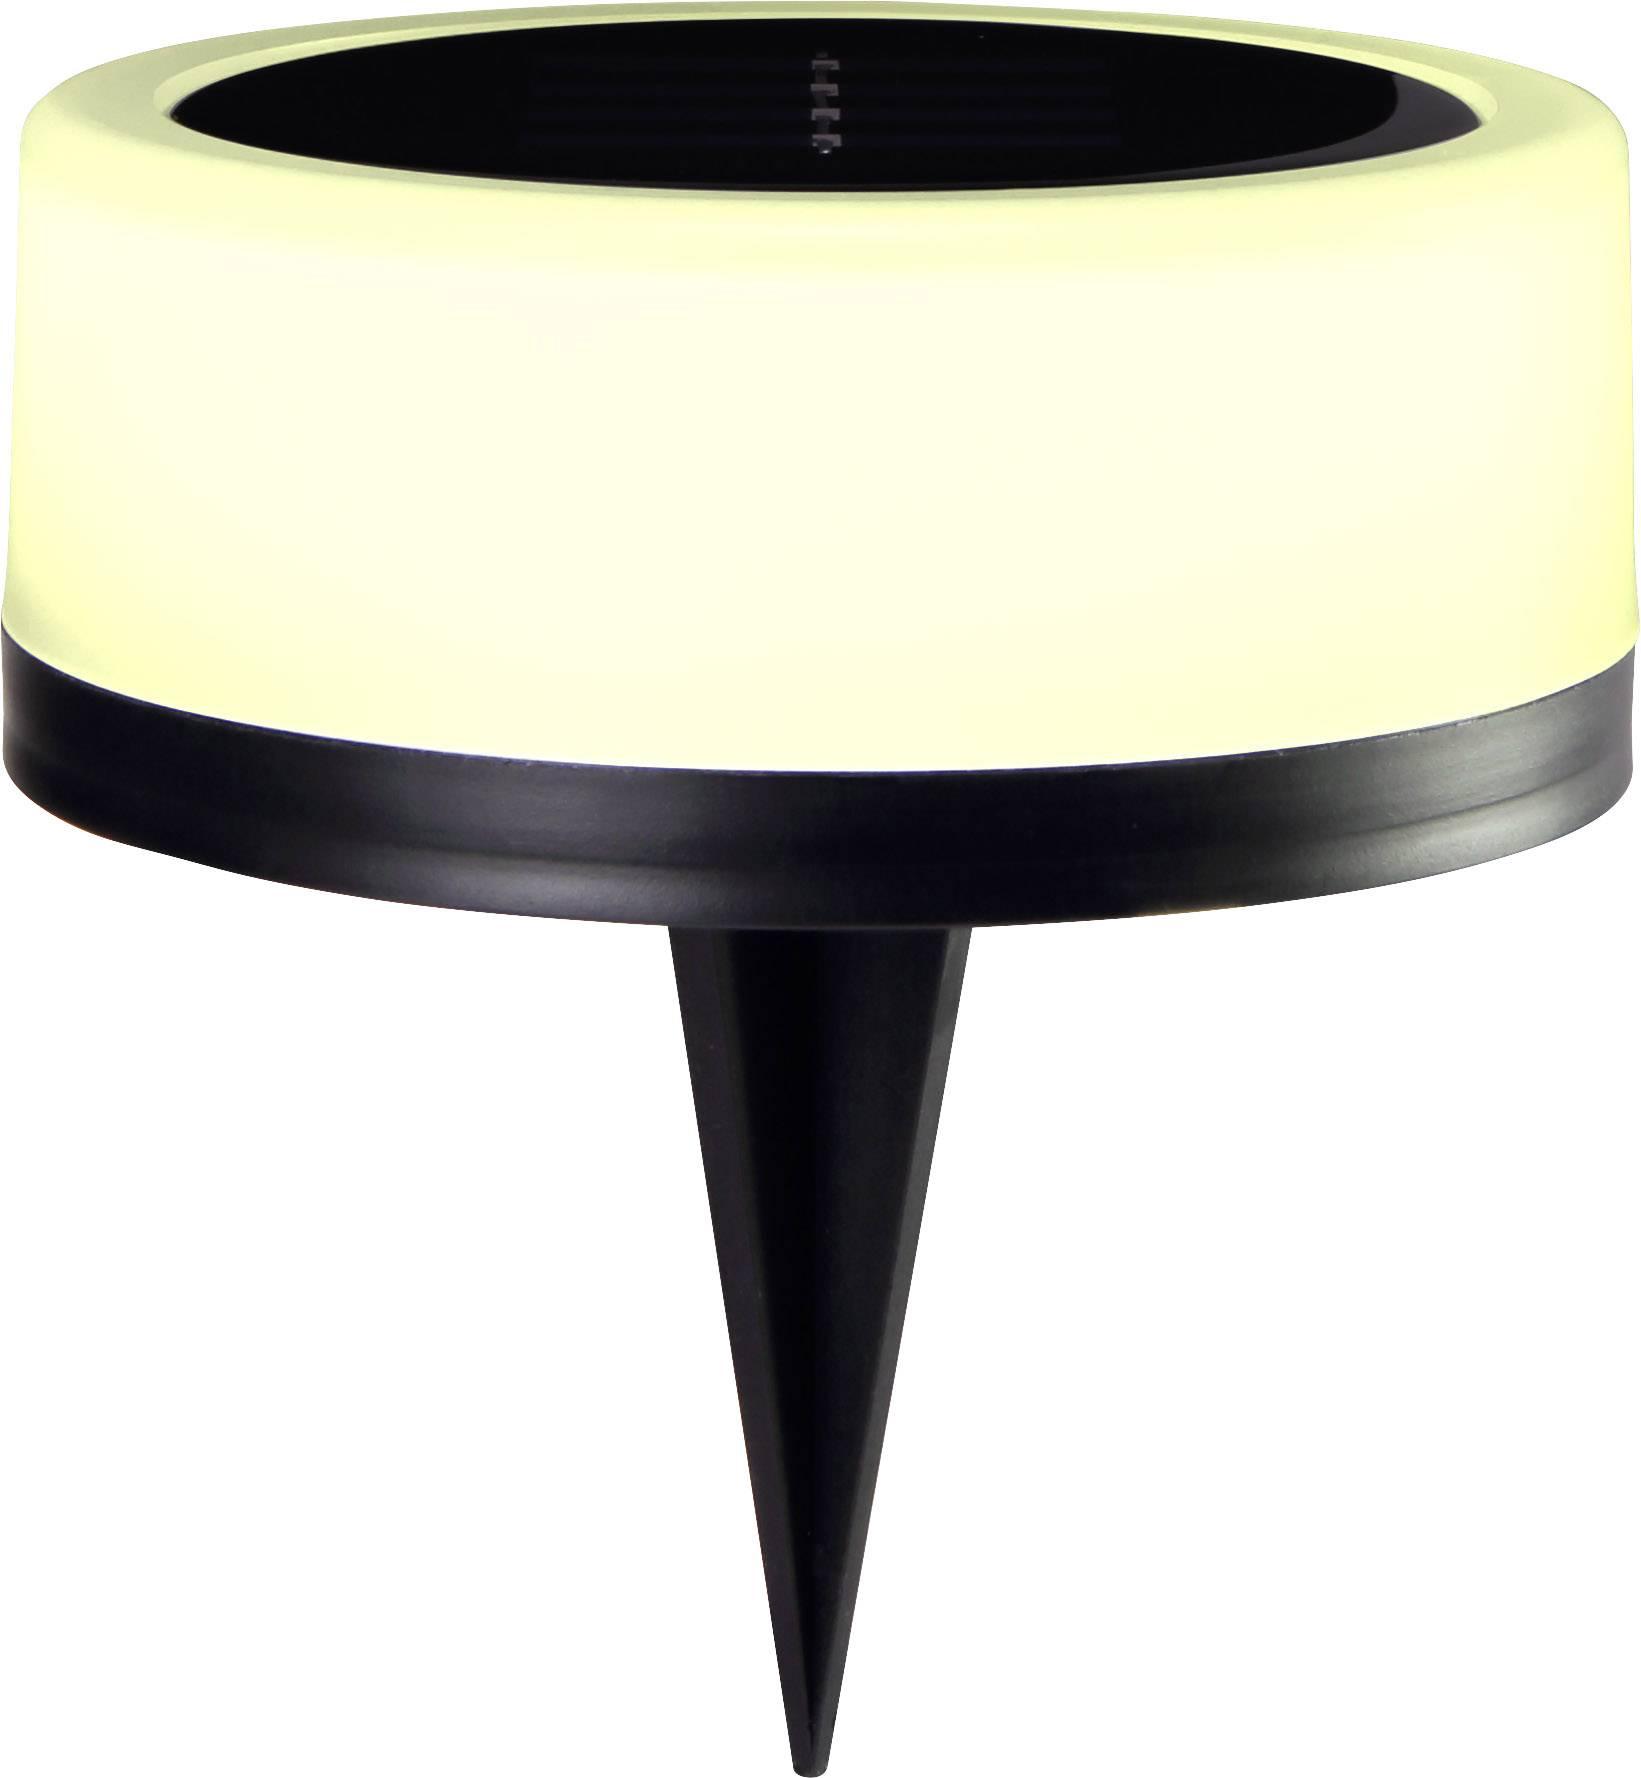 LED, RGB LED solární dekorativní osvětlení Polarlite EASY 100 PL-8375080, 0.16 W, IP44, teplá bílá, RGB